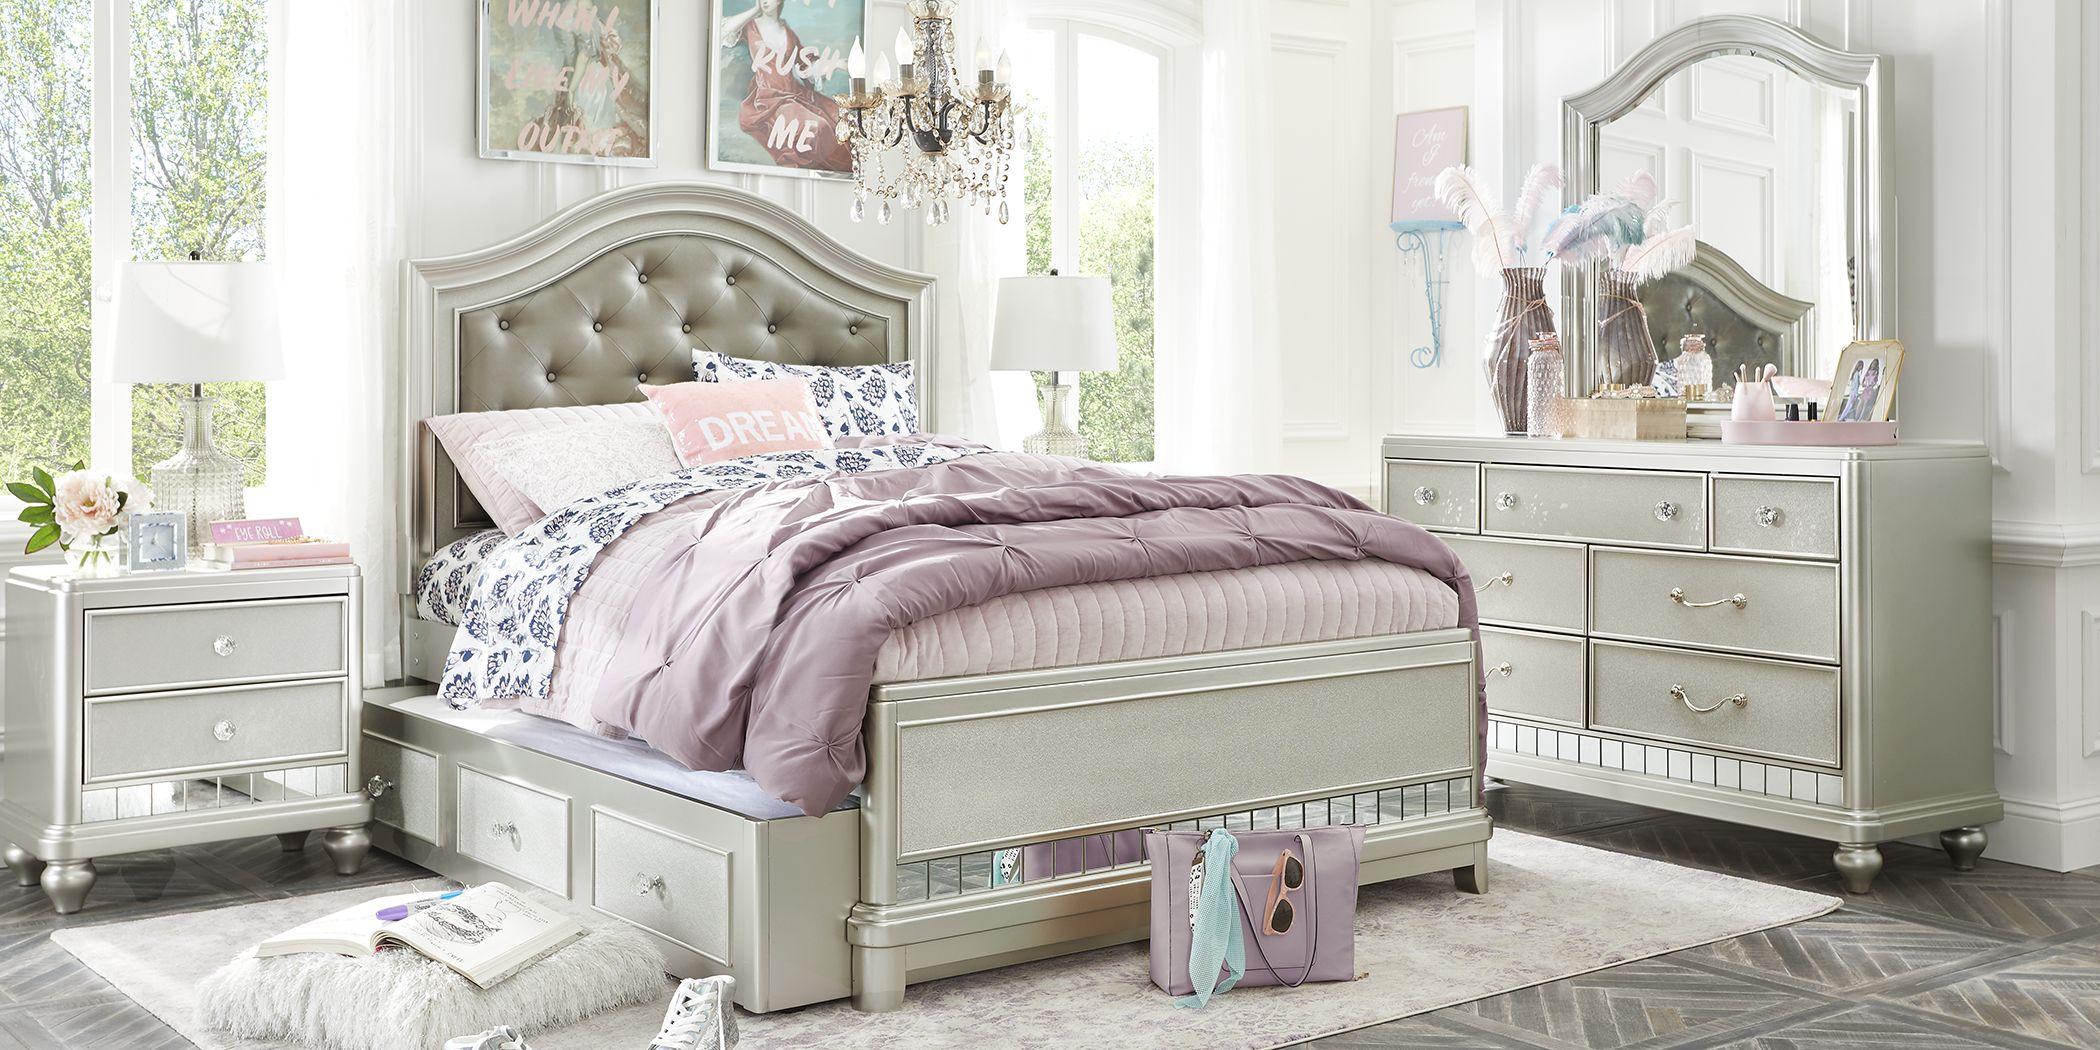 Sofia Vergara Furniture Collection Bedroom Sets More